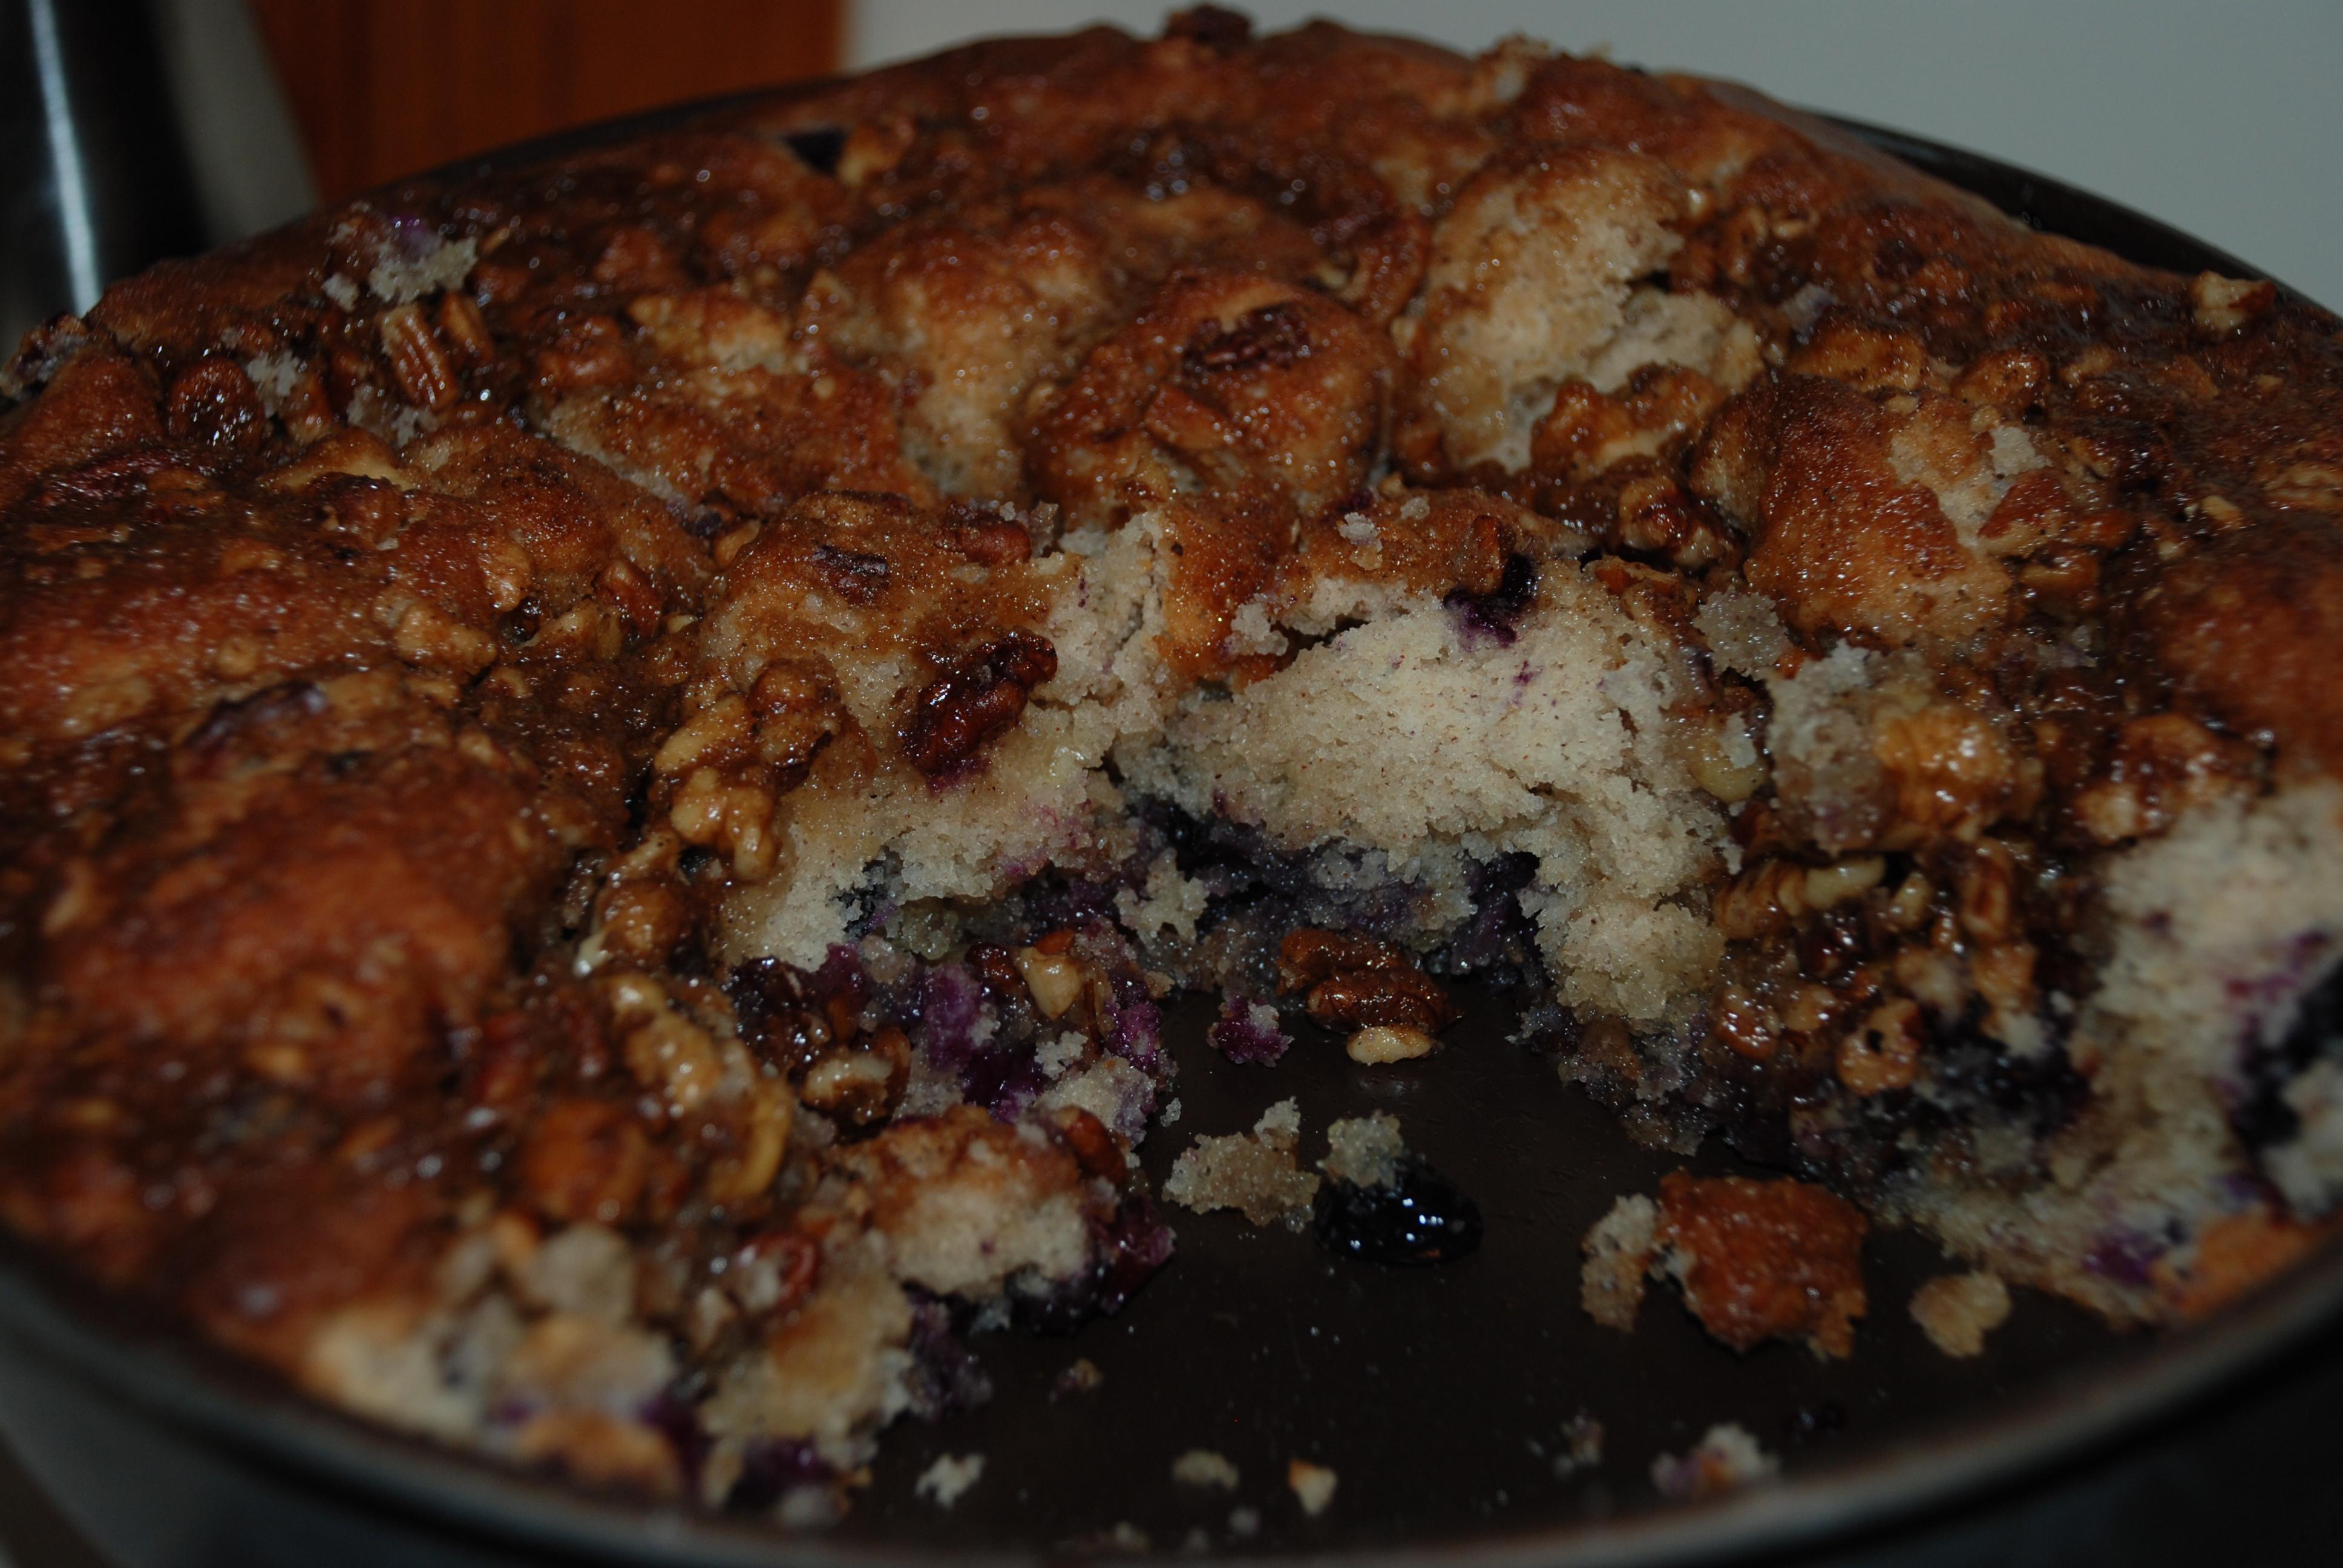 Blueberry Cinnamon Spice & Nut Coffee Cake ...